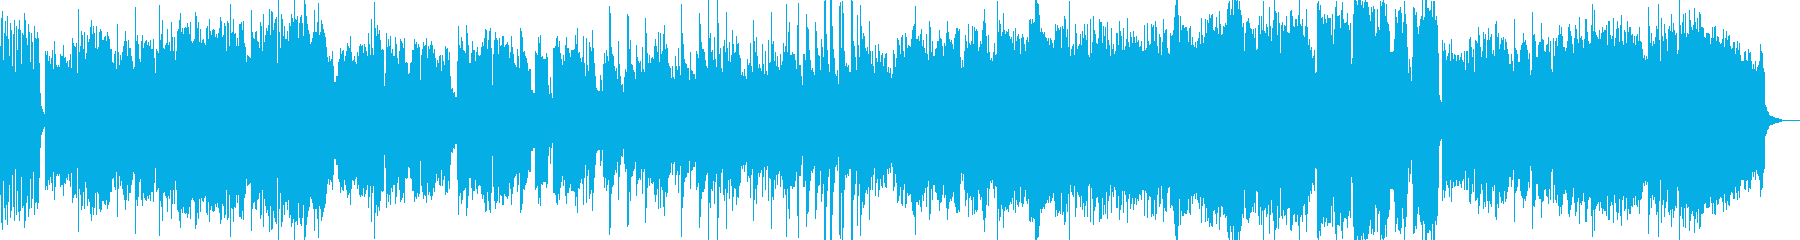 MELANCHOLY 雪の国からの再生済みの波形